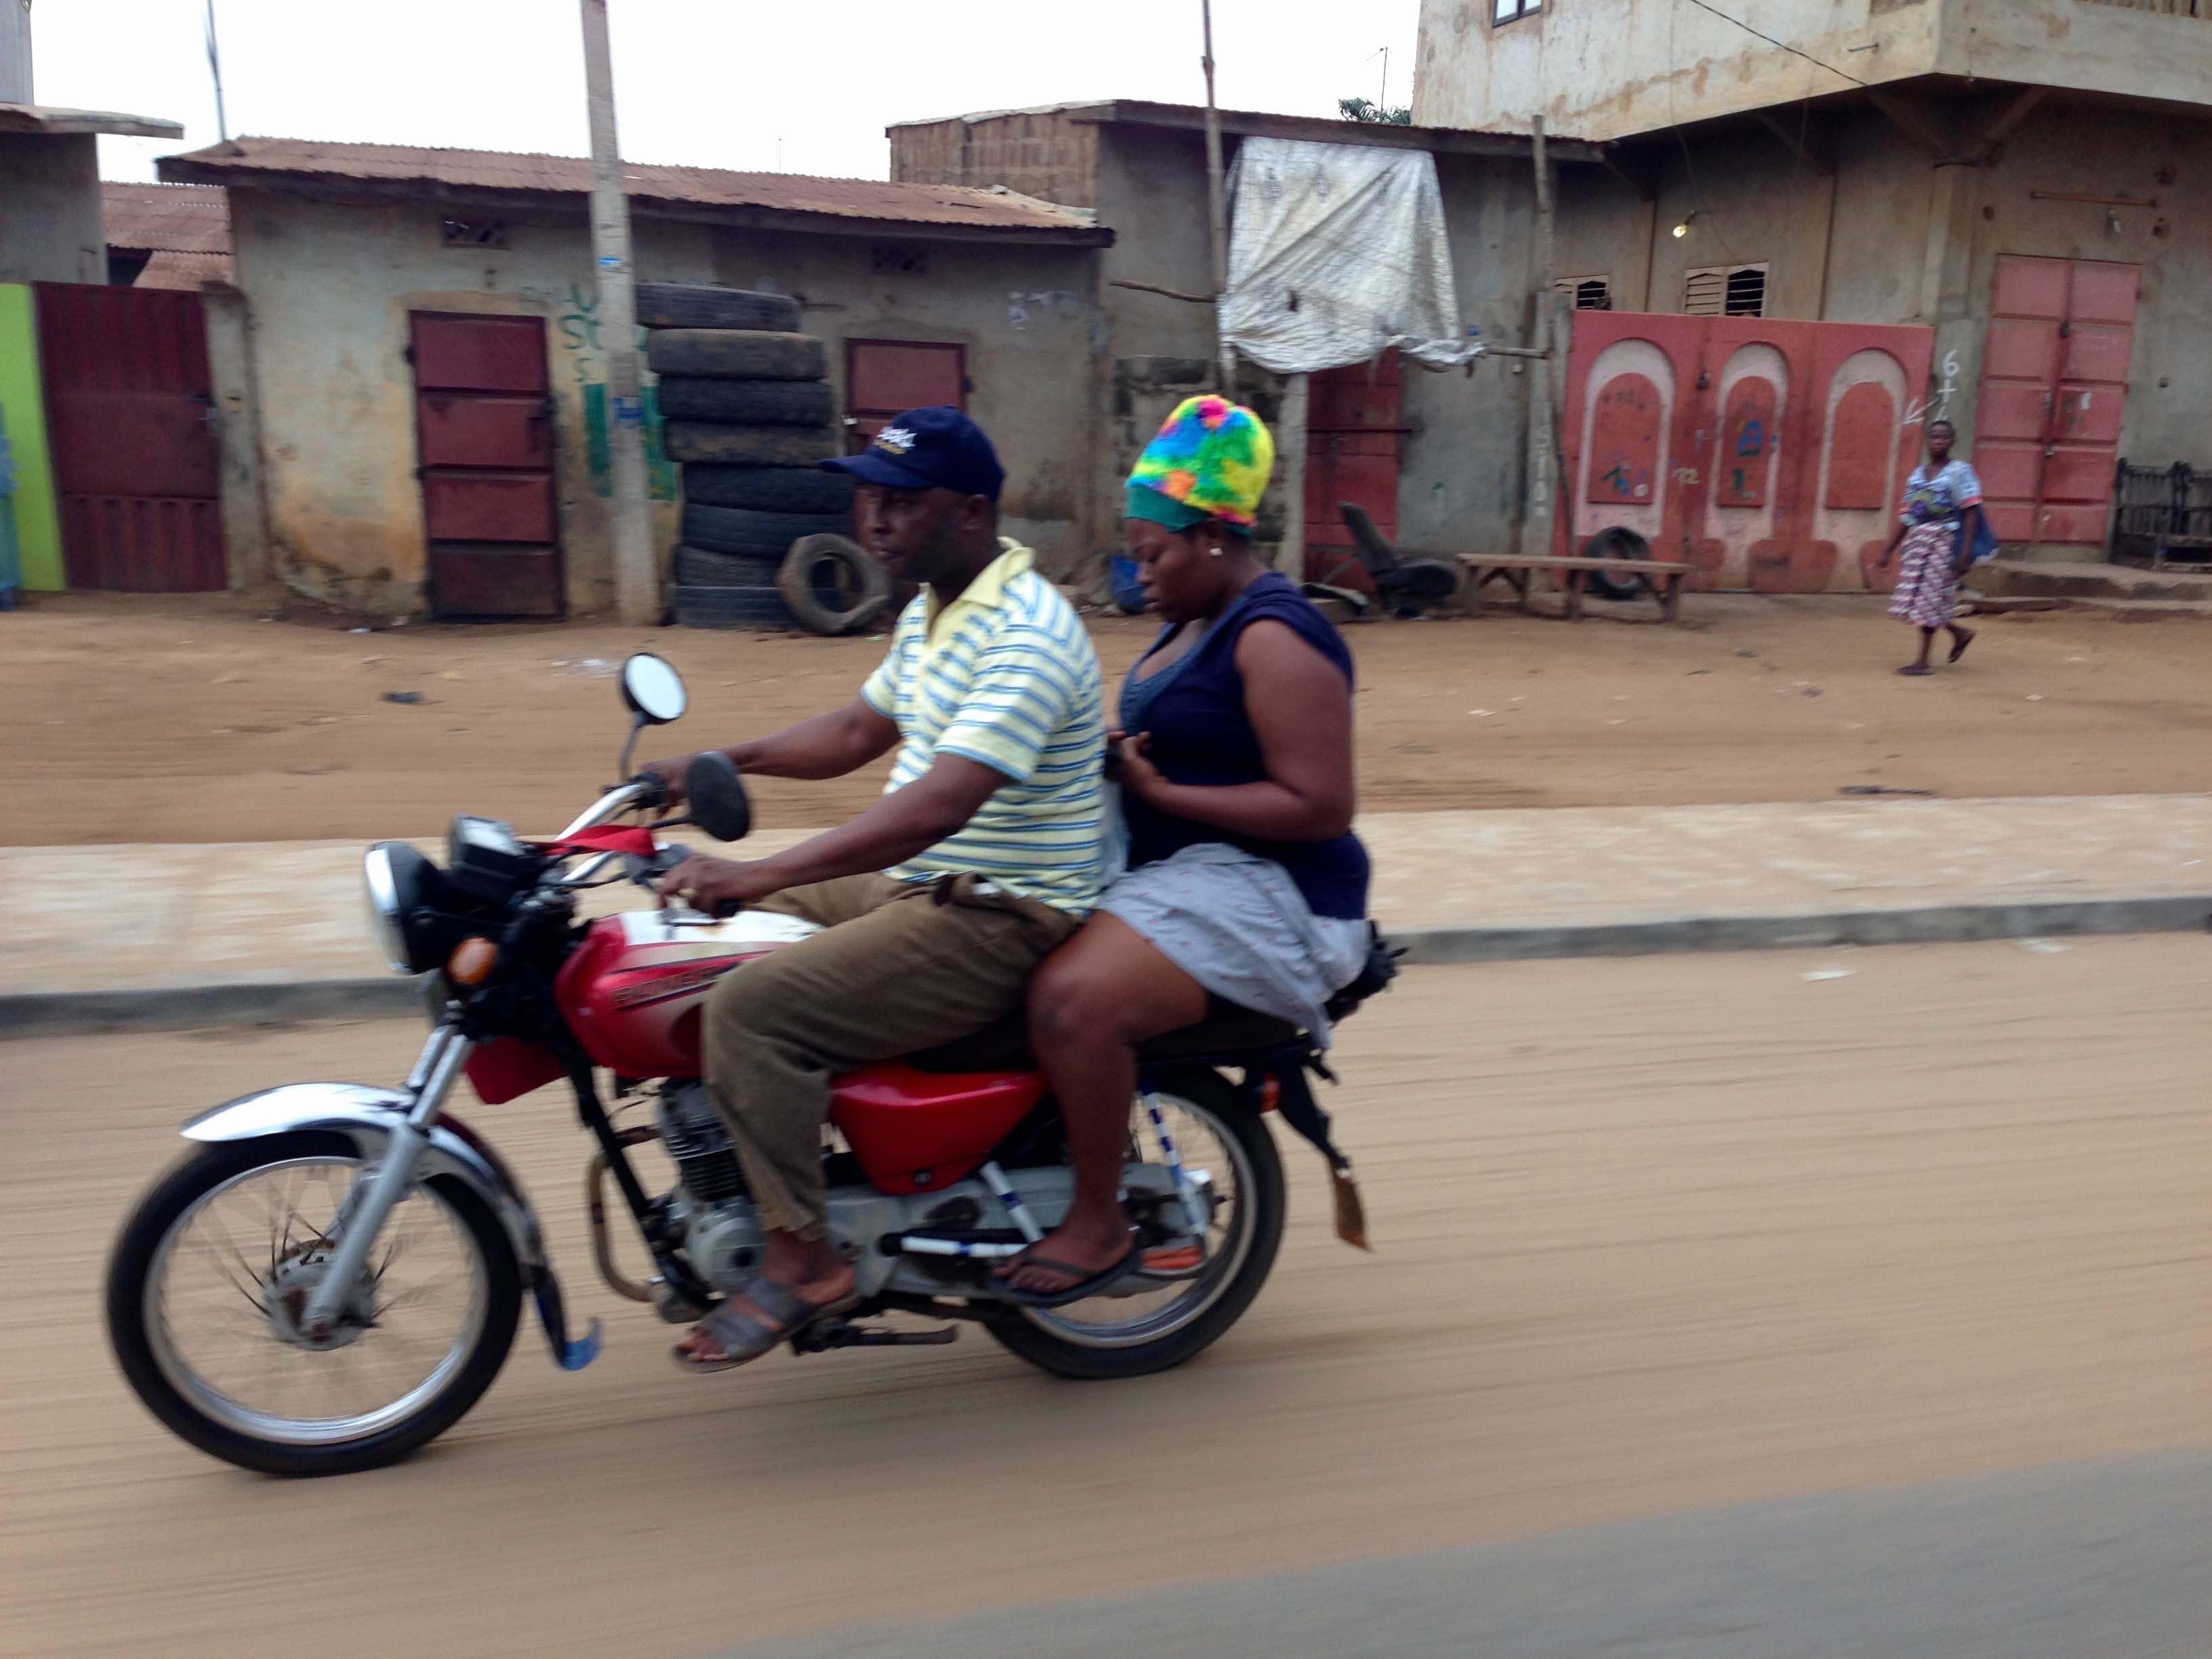 Motorcycling in Kokotomey